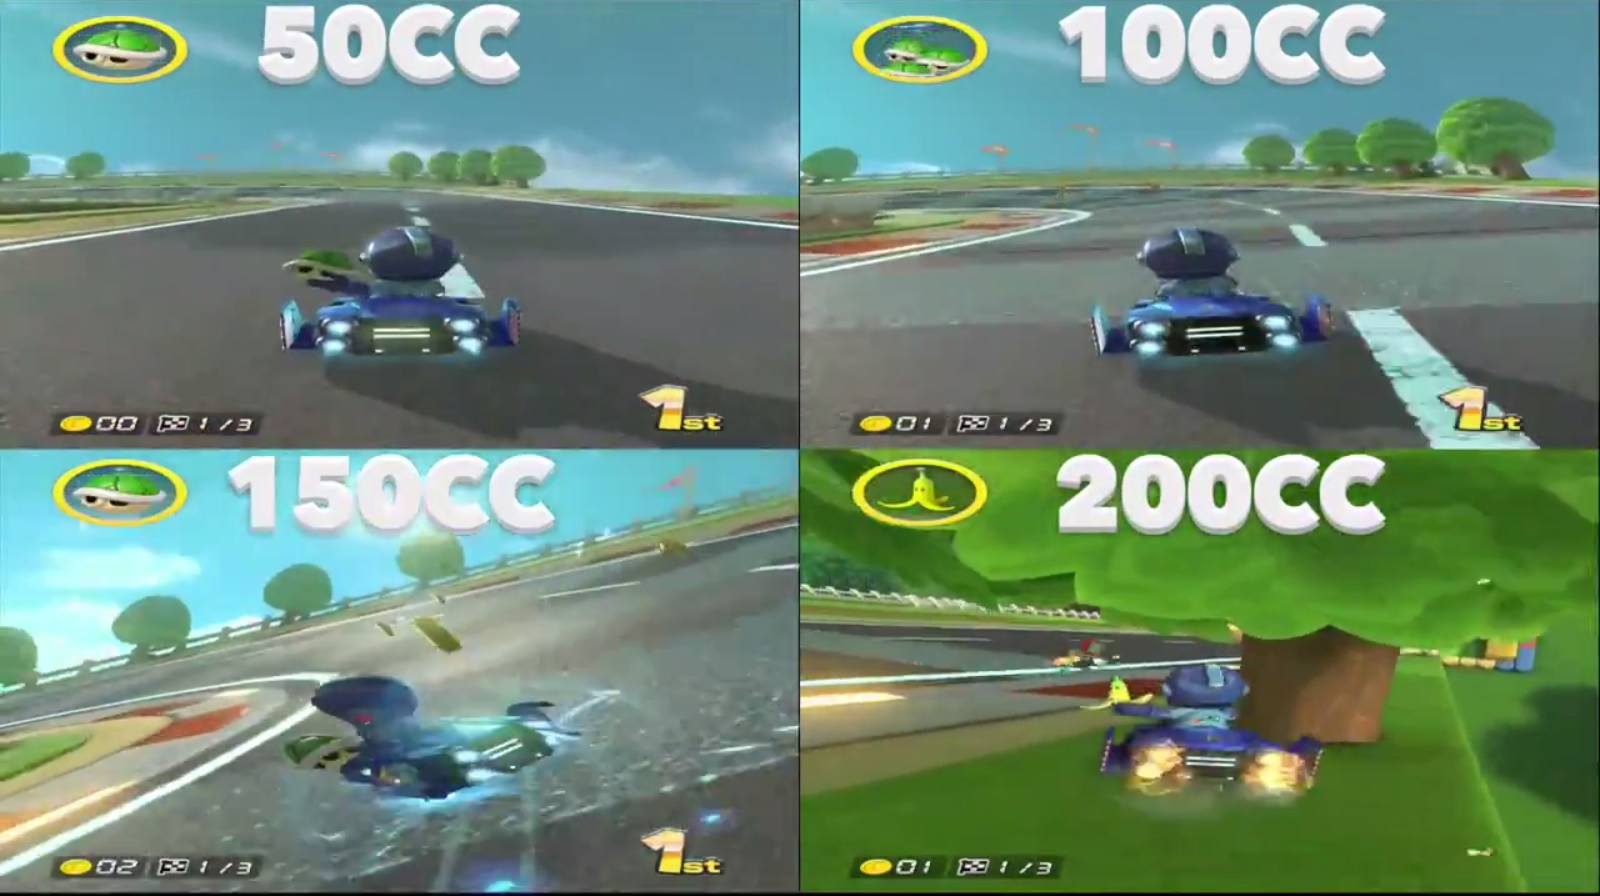 mario kart double dash 200cc